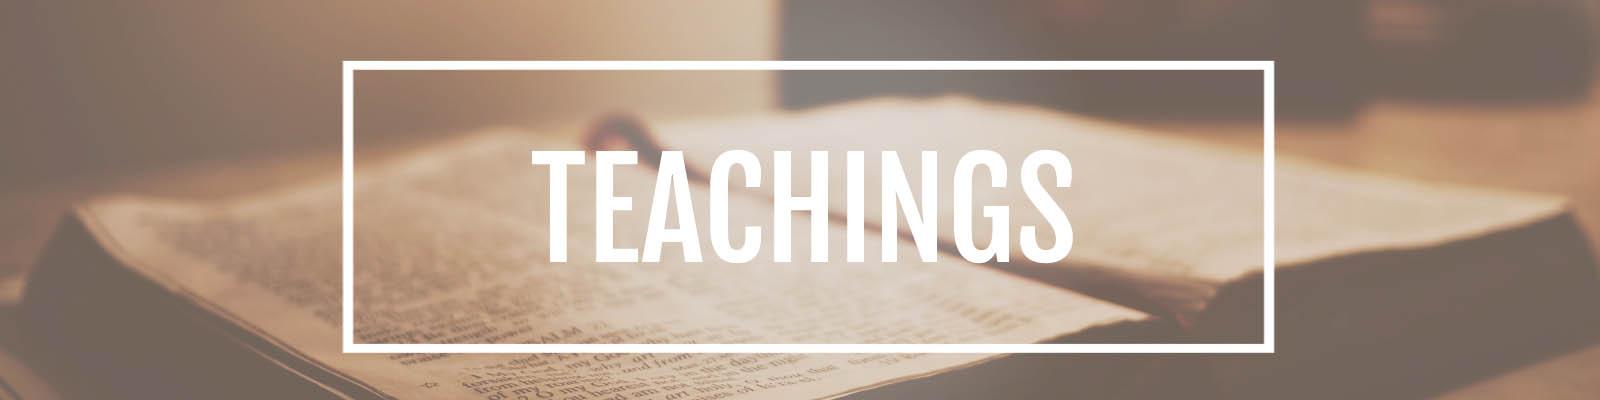 Fellowship-Bible-Church-Palmyra-Wisconsin-Teachings-Header.jpg